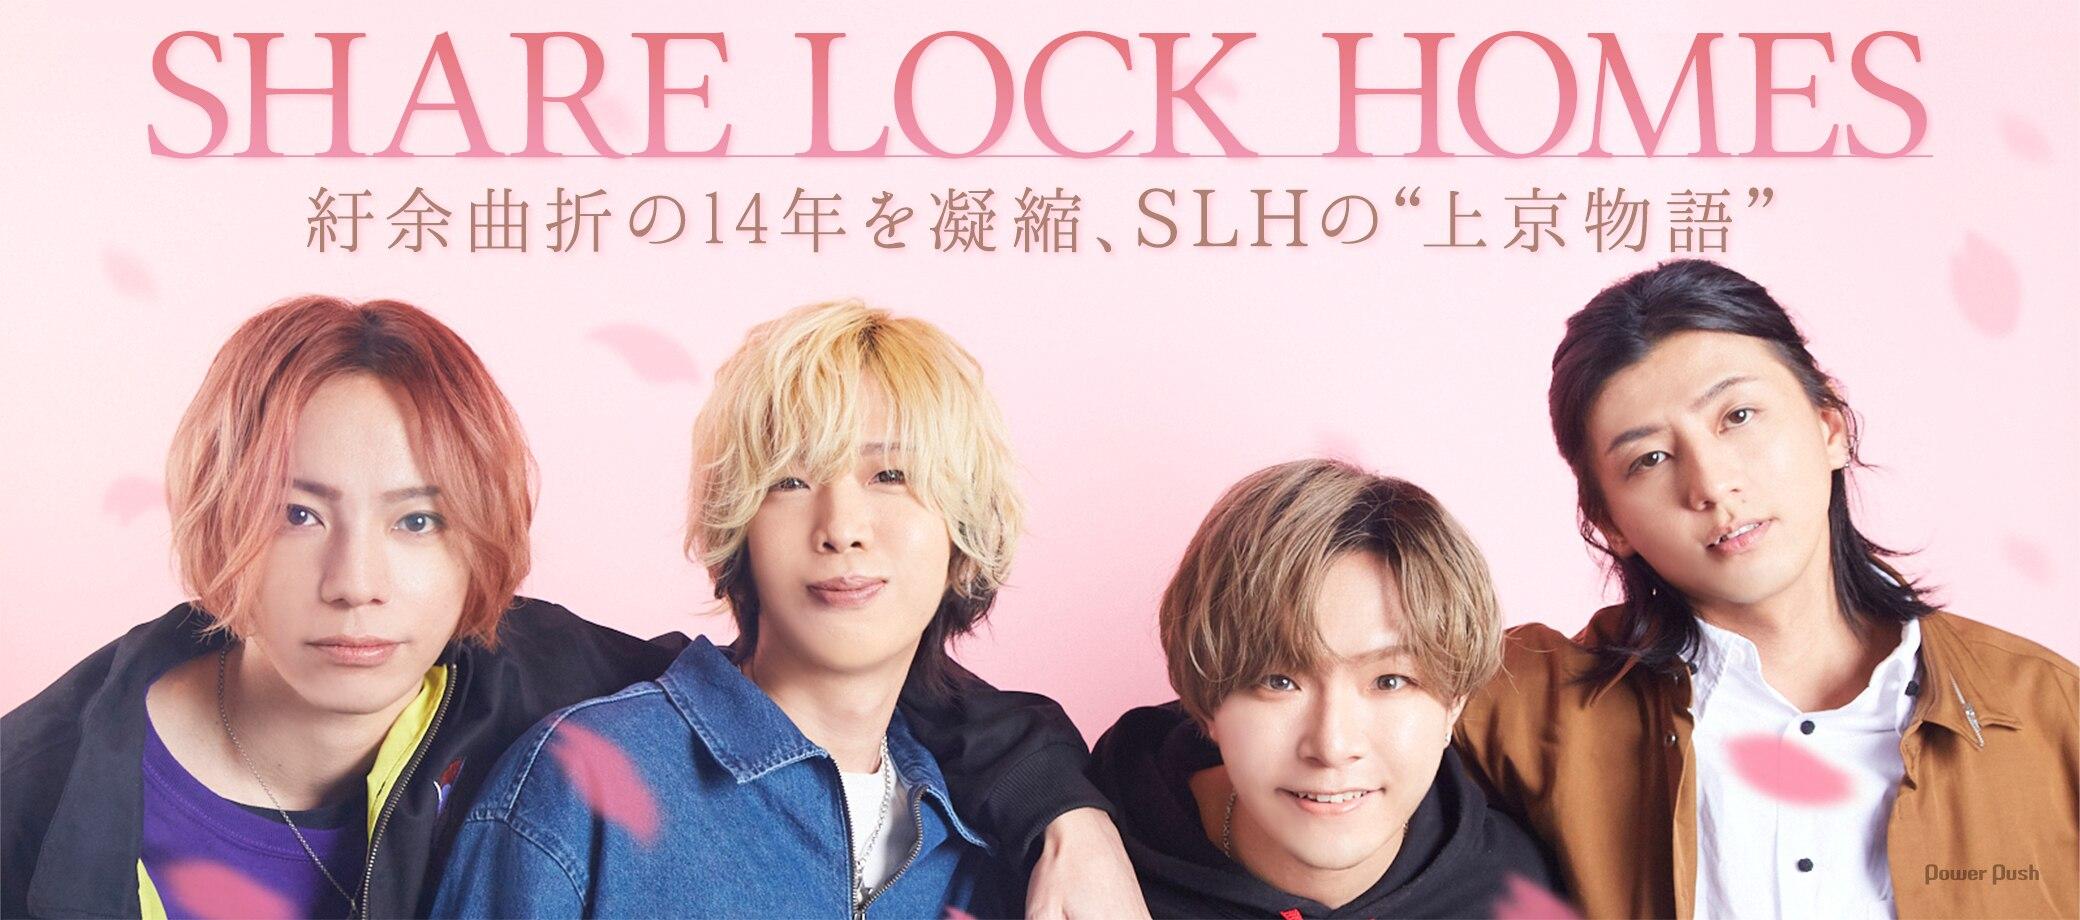 "SHARE LOCK HOMES|紆余曲折の14年を凝縮、SLHの""上京物語"""